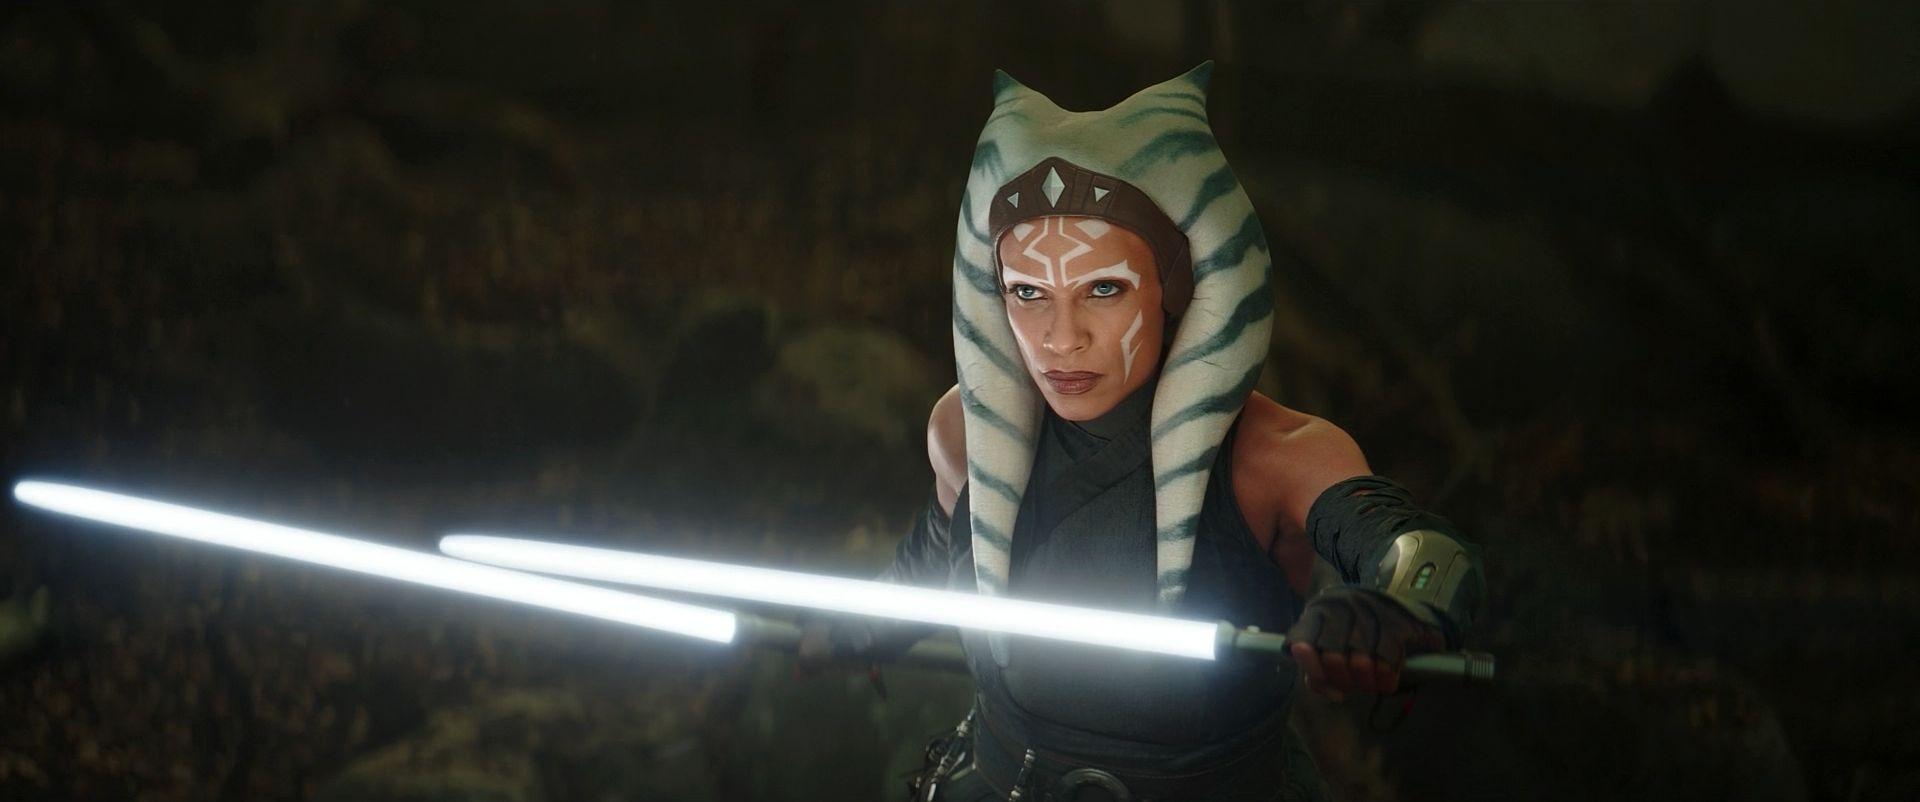 Мандалорец — s02e05 — Chapter 13: The Jedi